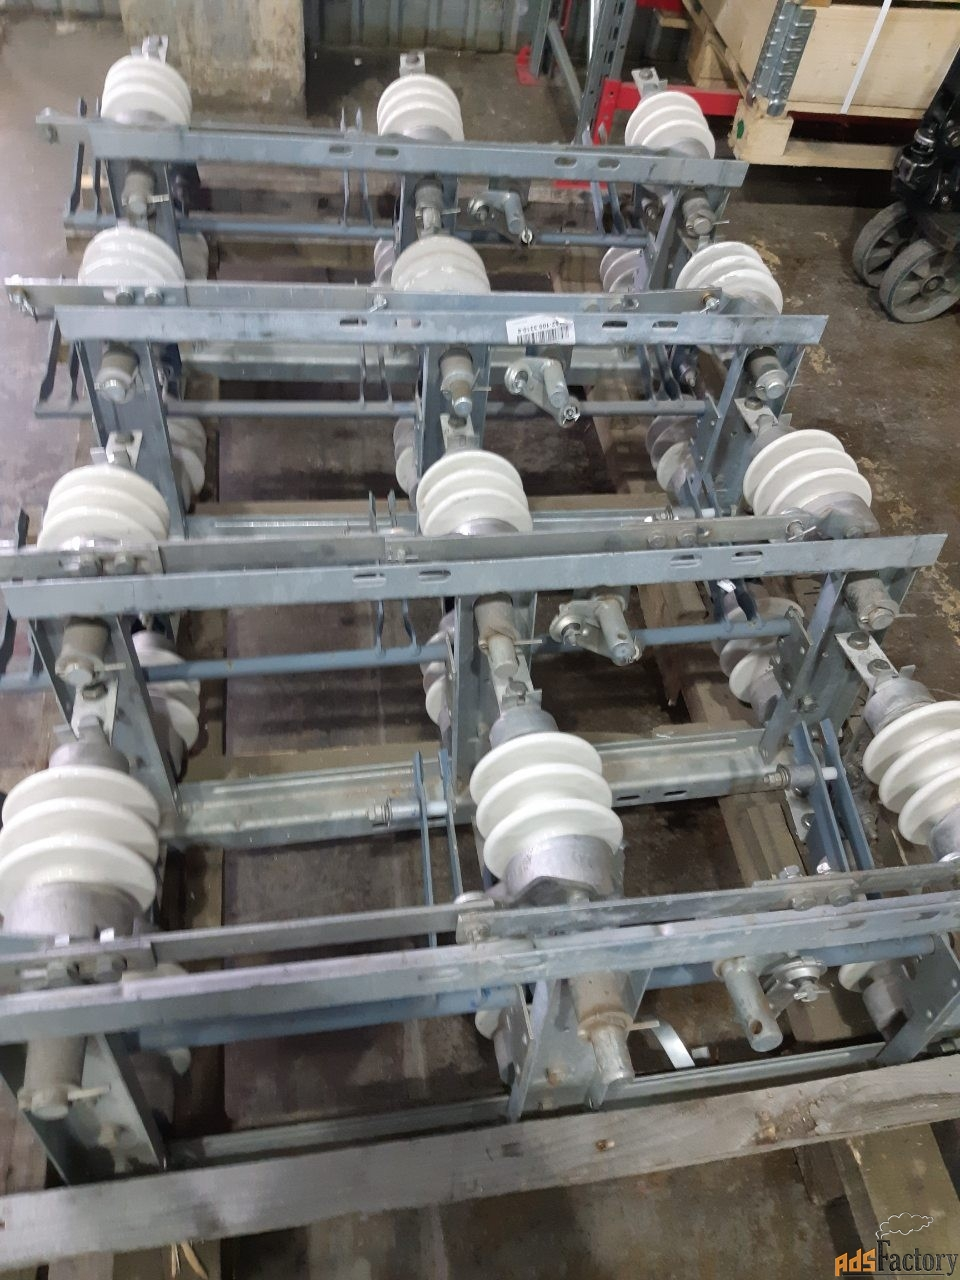 разъединитель рлнд-1.1-10б/400 нухл1 3п с прг-01-2бухл1